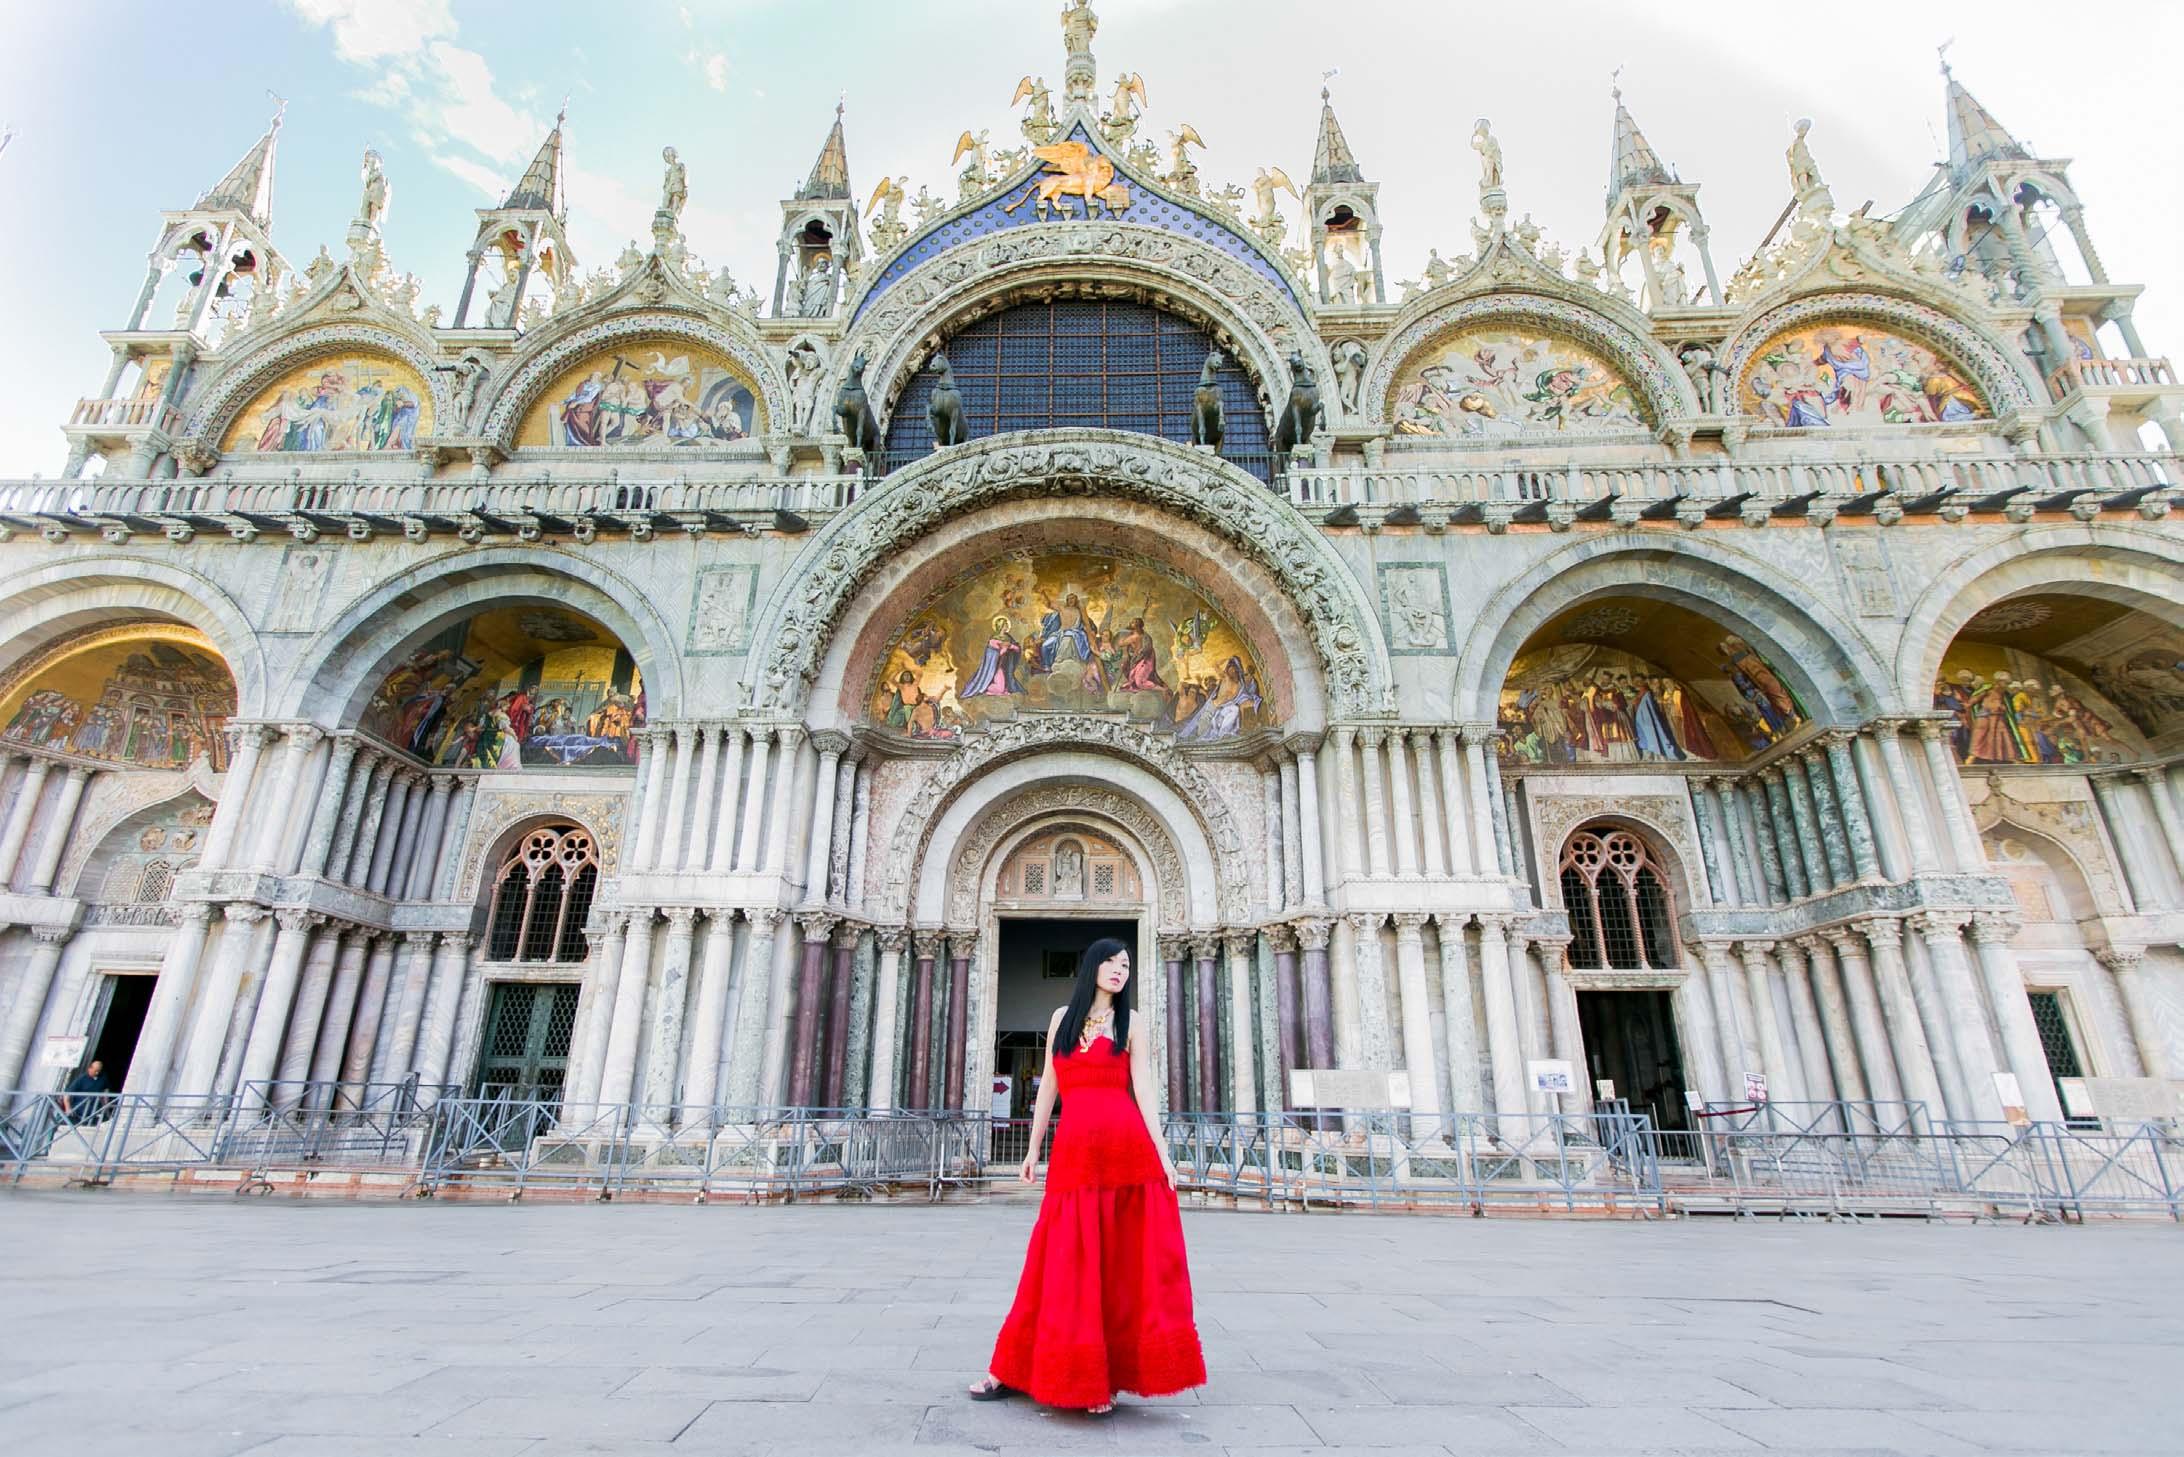 Basilica de San Marco (Saint Mark's Basilica)